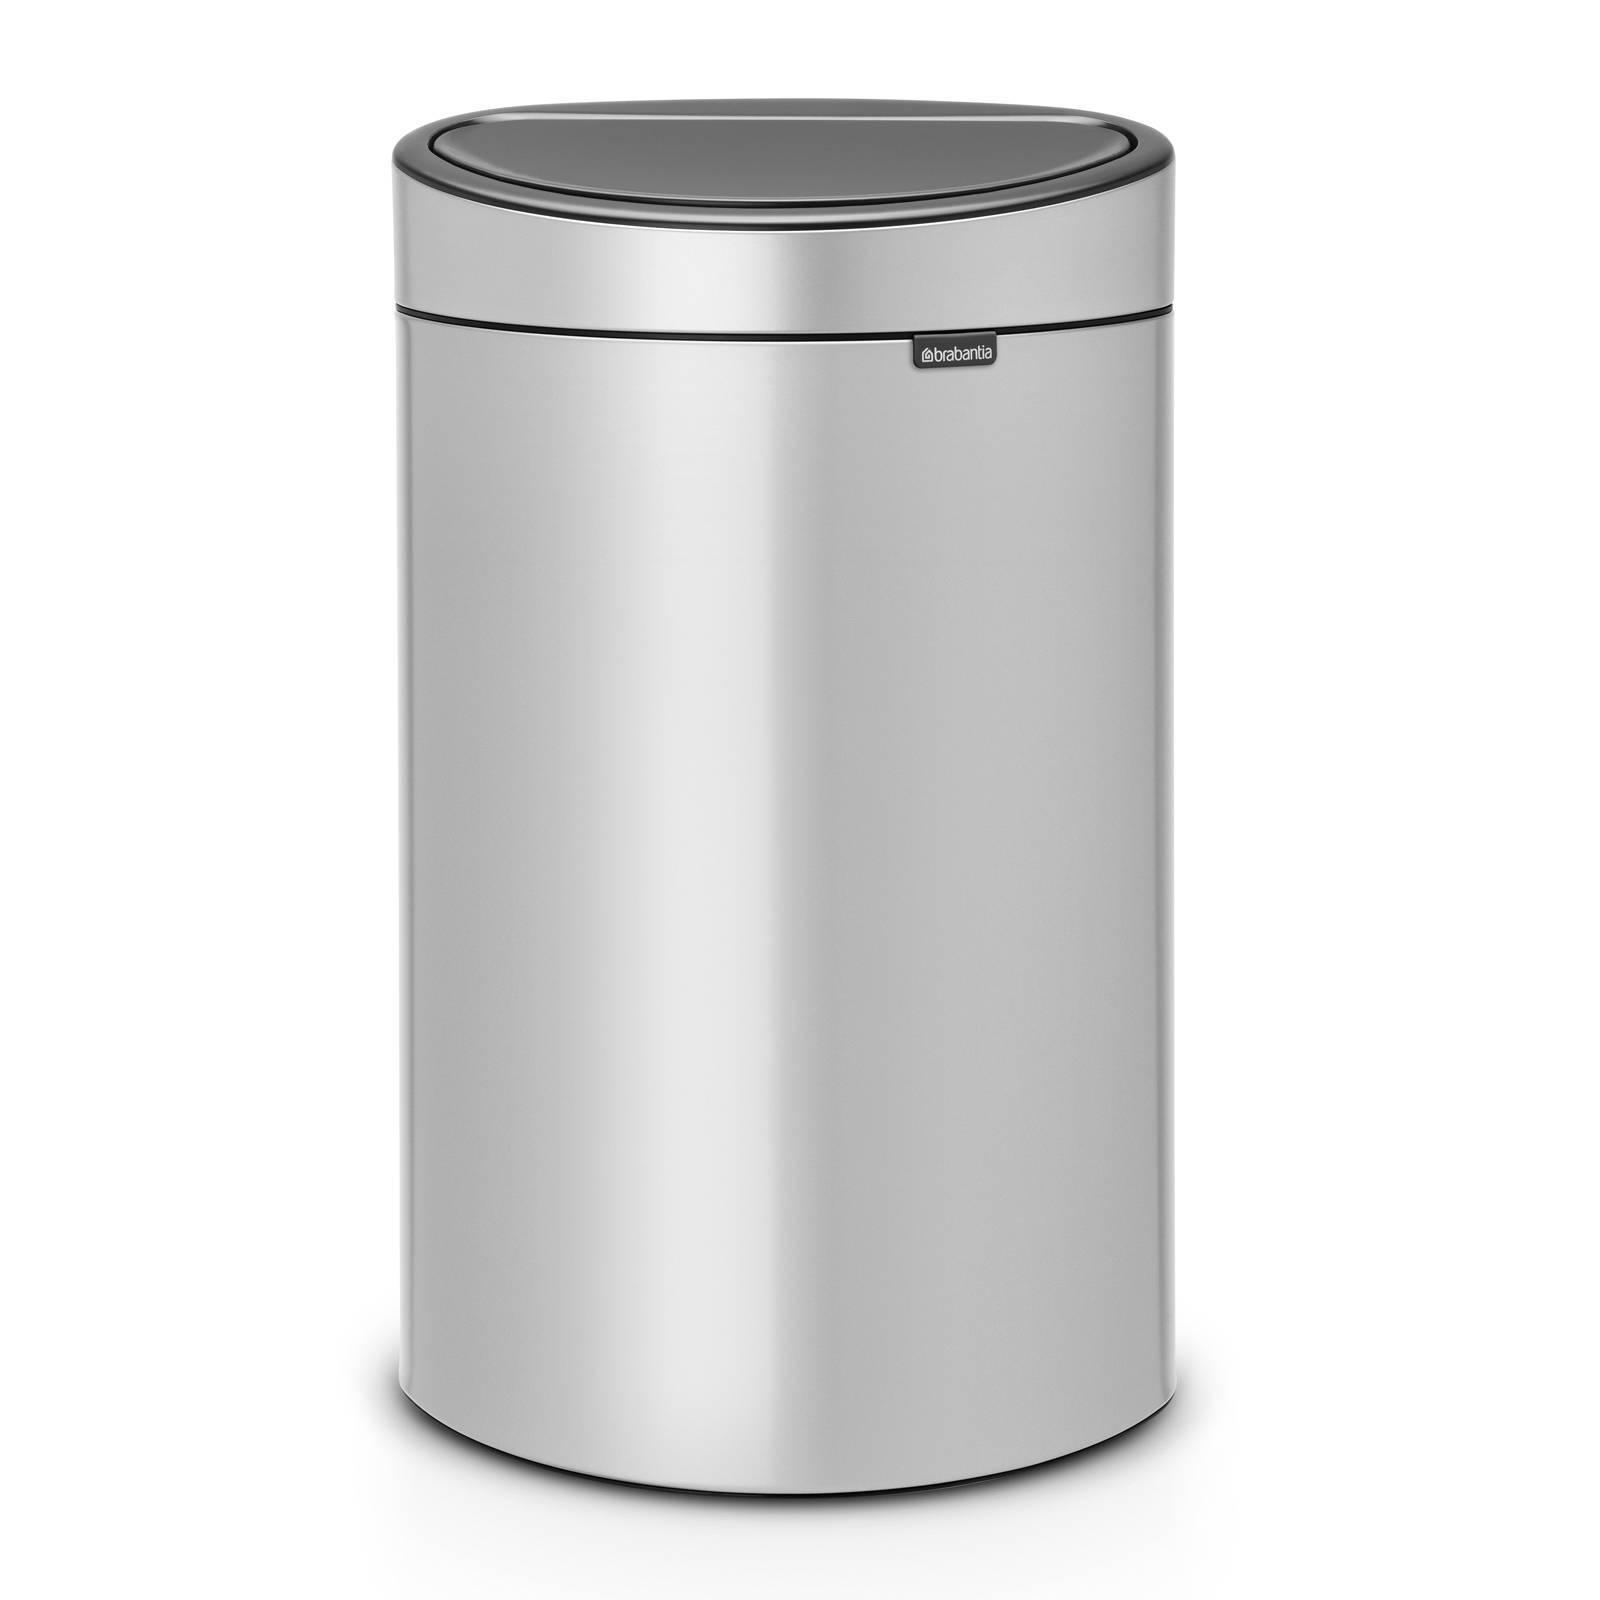 Brabantia Prullenbak 40 Liter.Touch Bin 40 Liter Prullenbak